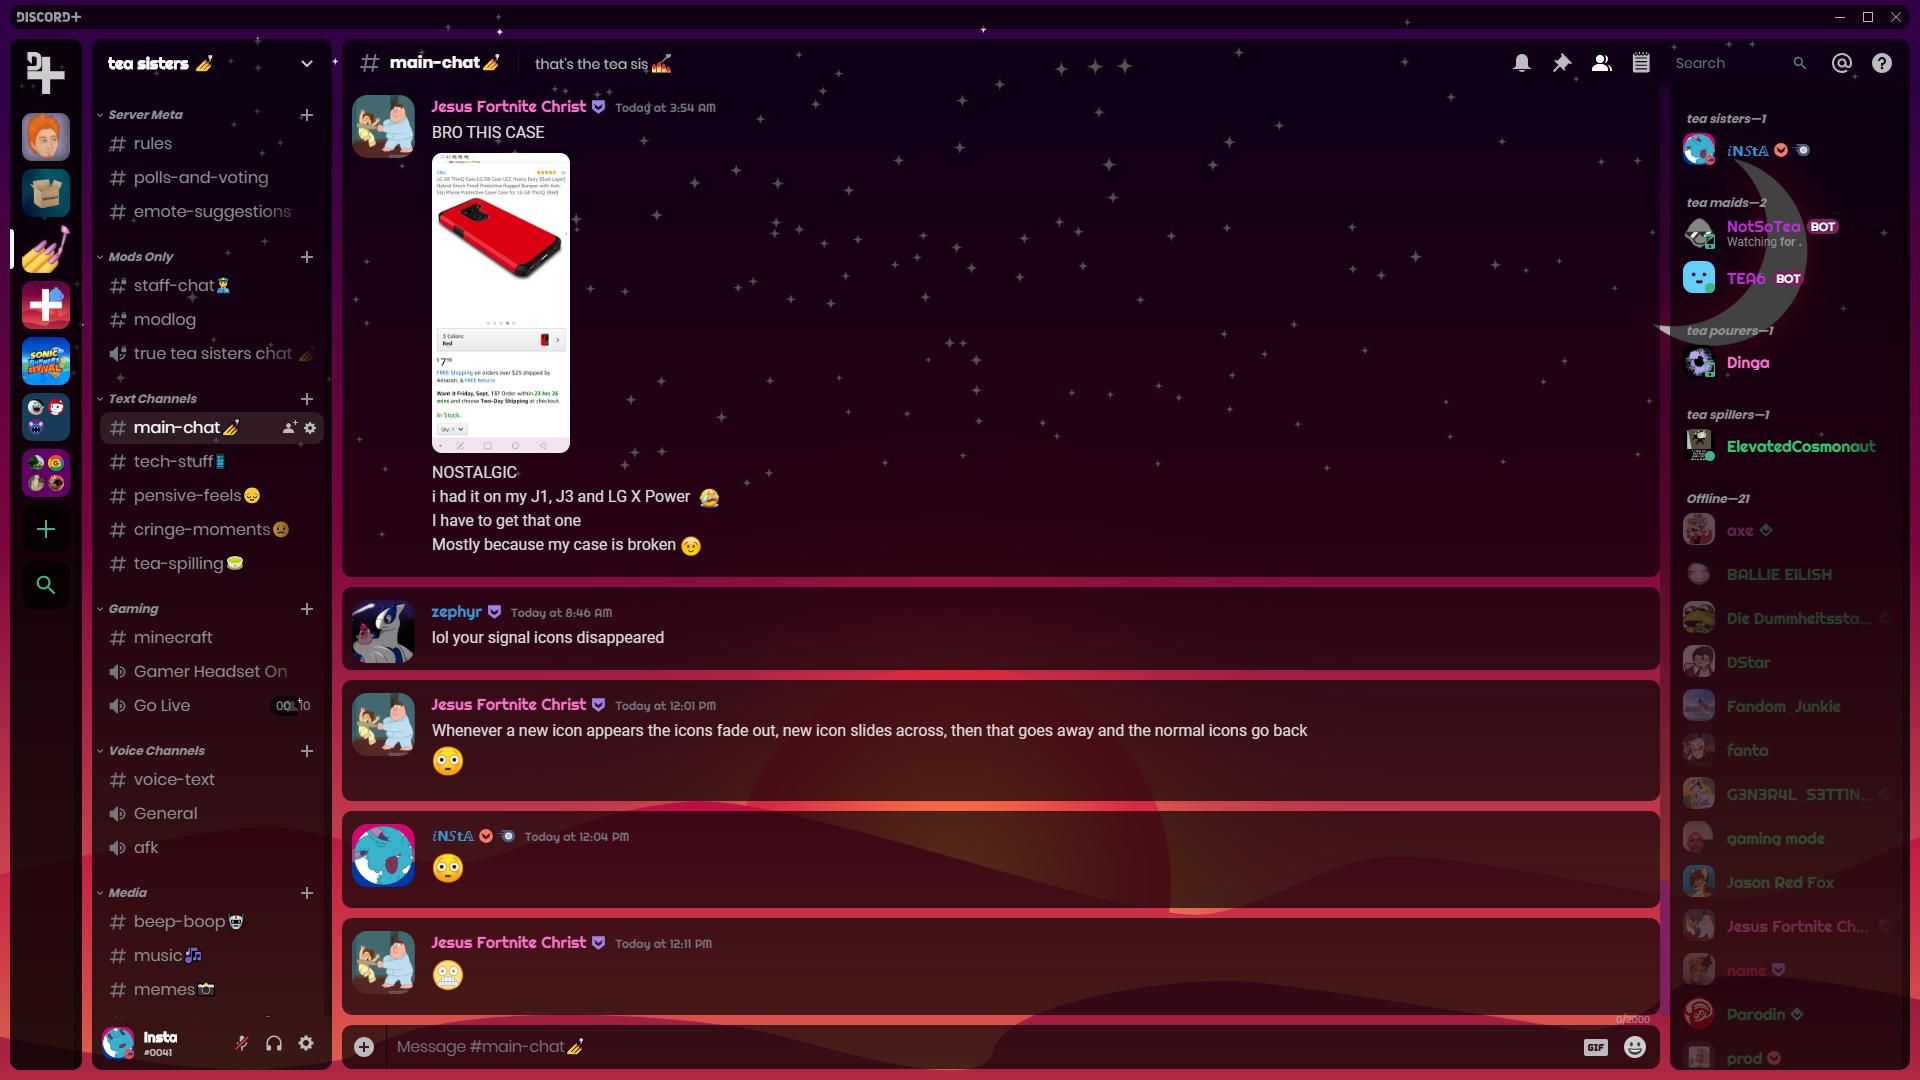 GitHub - PlusInsta/discord-plus: A sleek, customizable